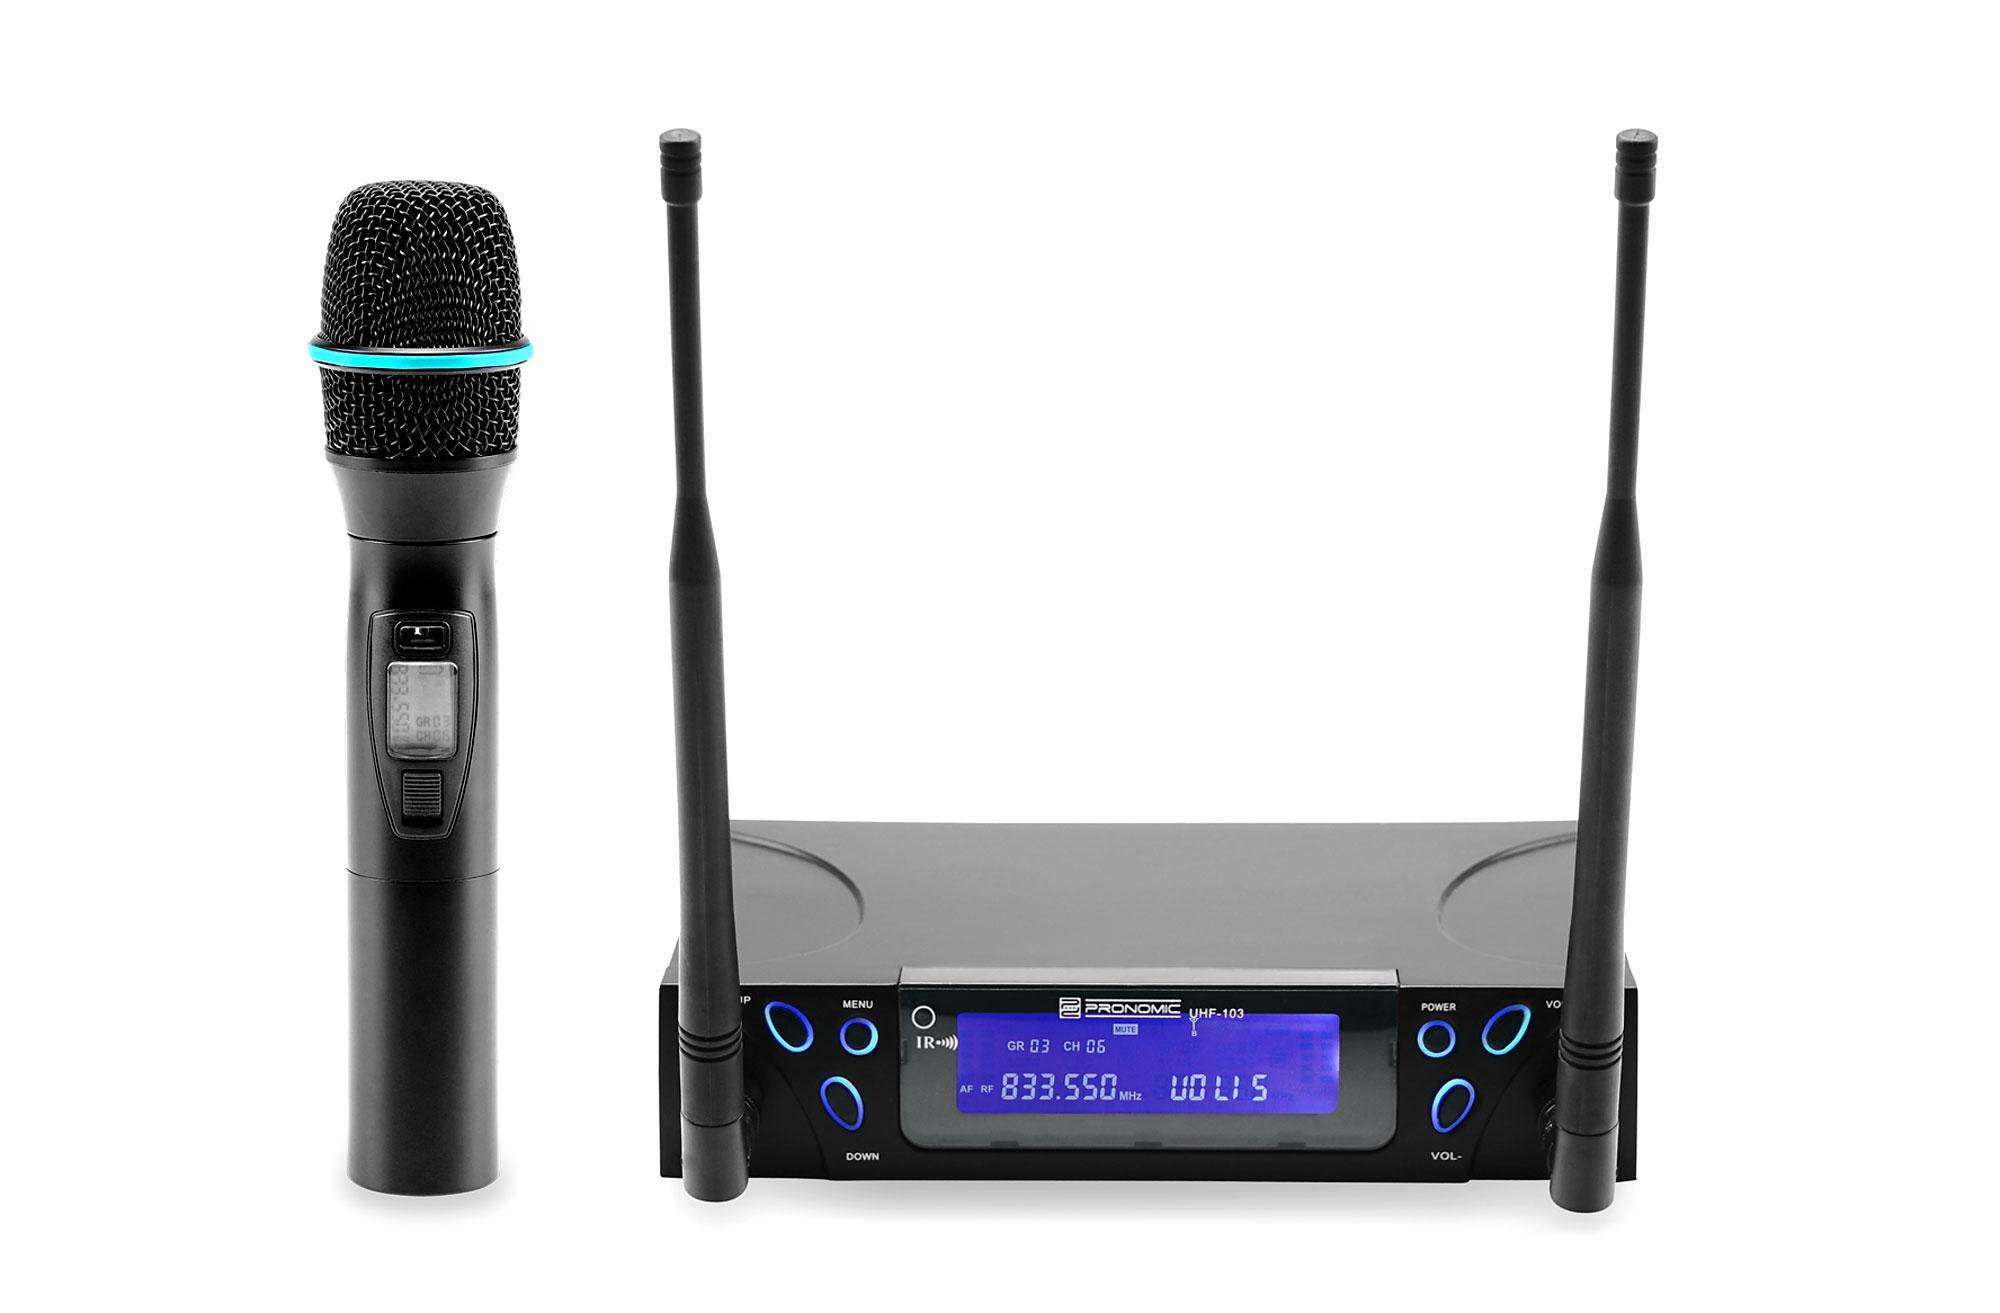 Pronomic UHF 103 True Diversity Hand Funkmikrofon Set Retoure (Zustand gut)